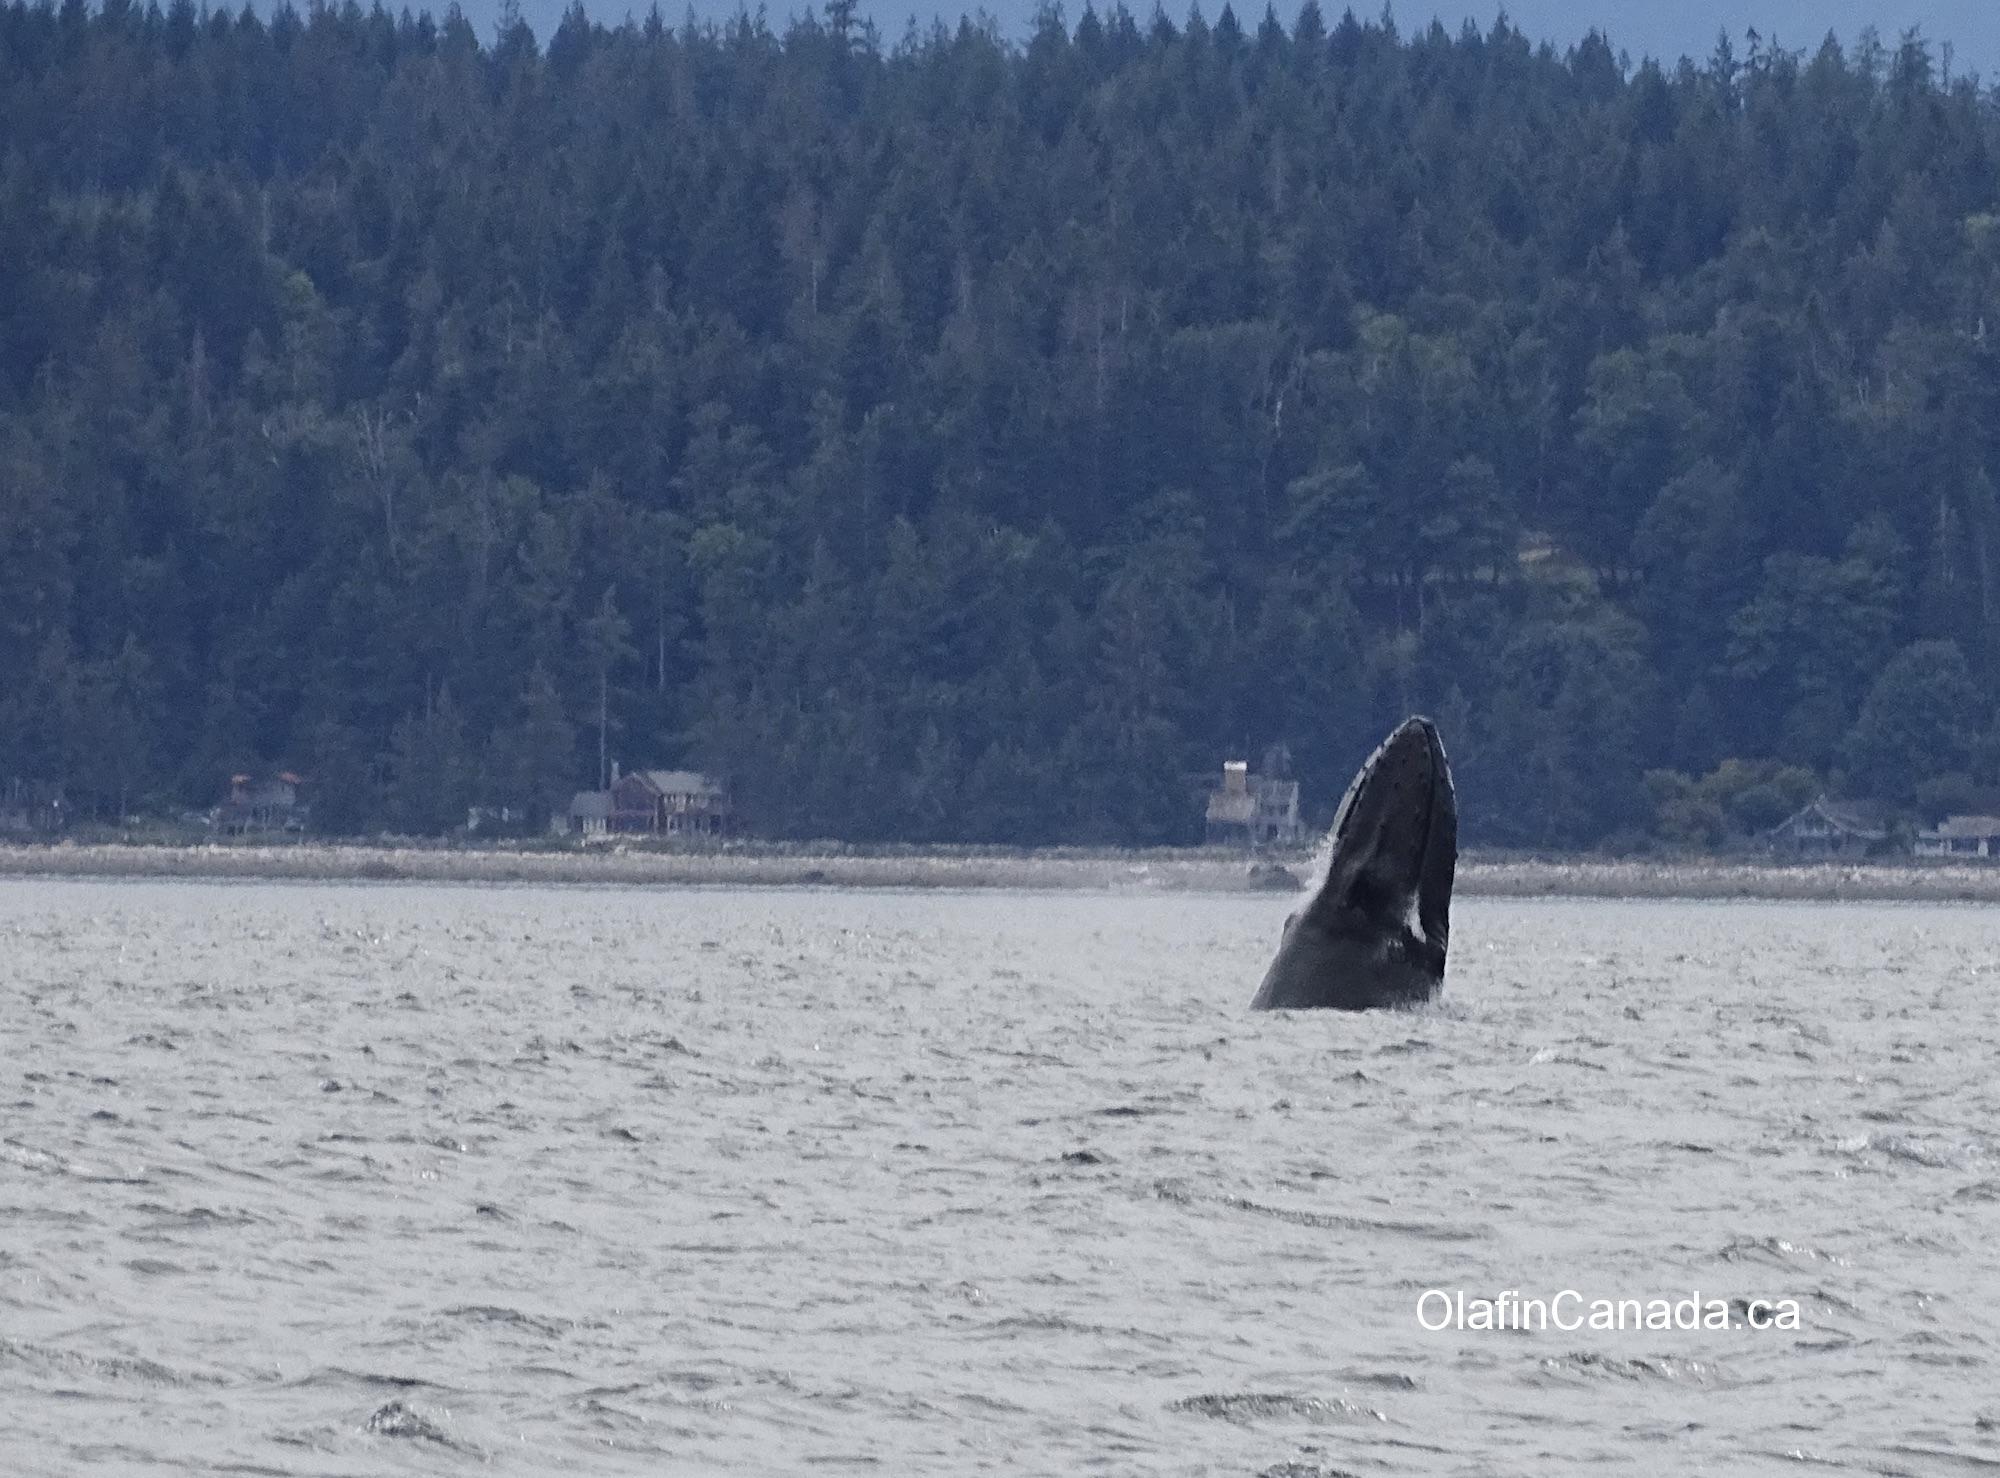 Curious humpback whale near Campbell River #olafincanada #britishcolumbia #discoverbc #wildlife #campbellriver #humpbackwhale